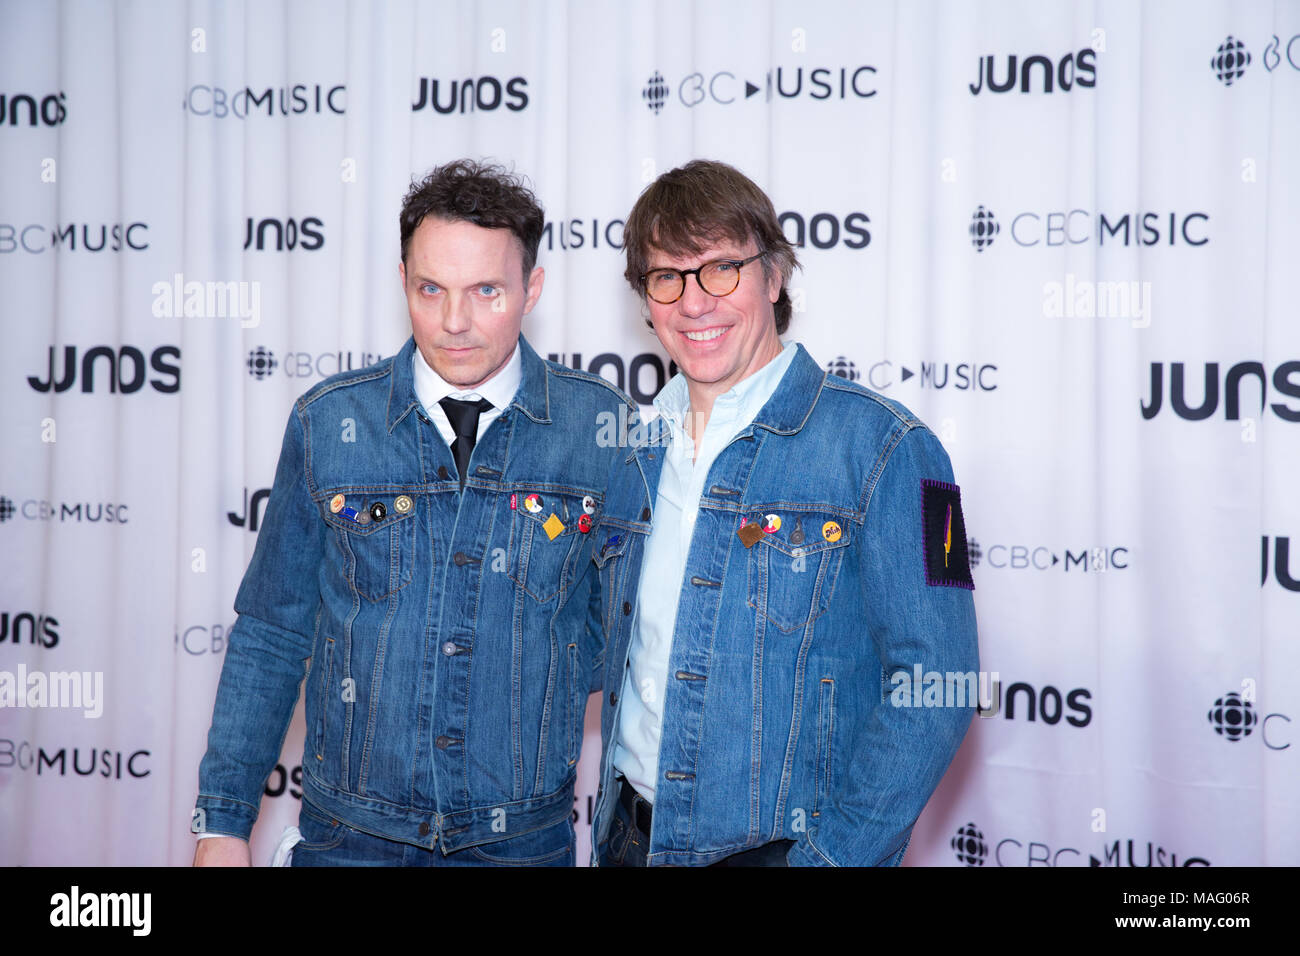 Patrick und Mike Downie backstage nach ehren ihre Mühe Gord Downie am 2018 Juno Awards Gala. Bobby Singh/@fohphoto Stockbild